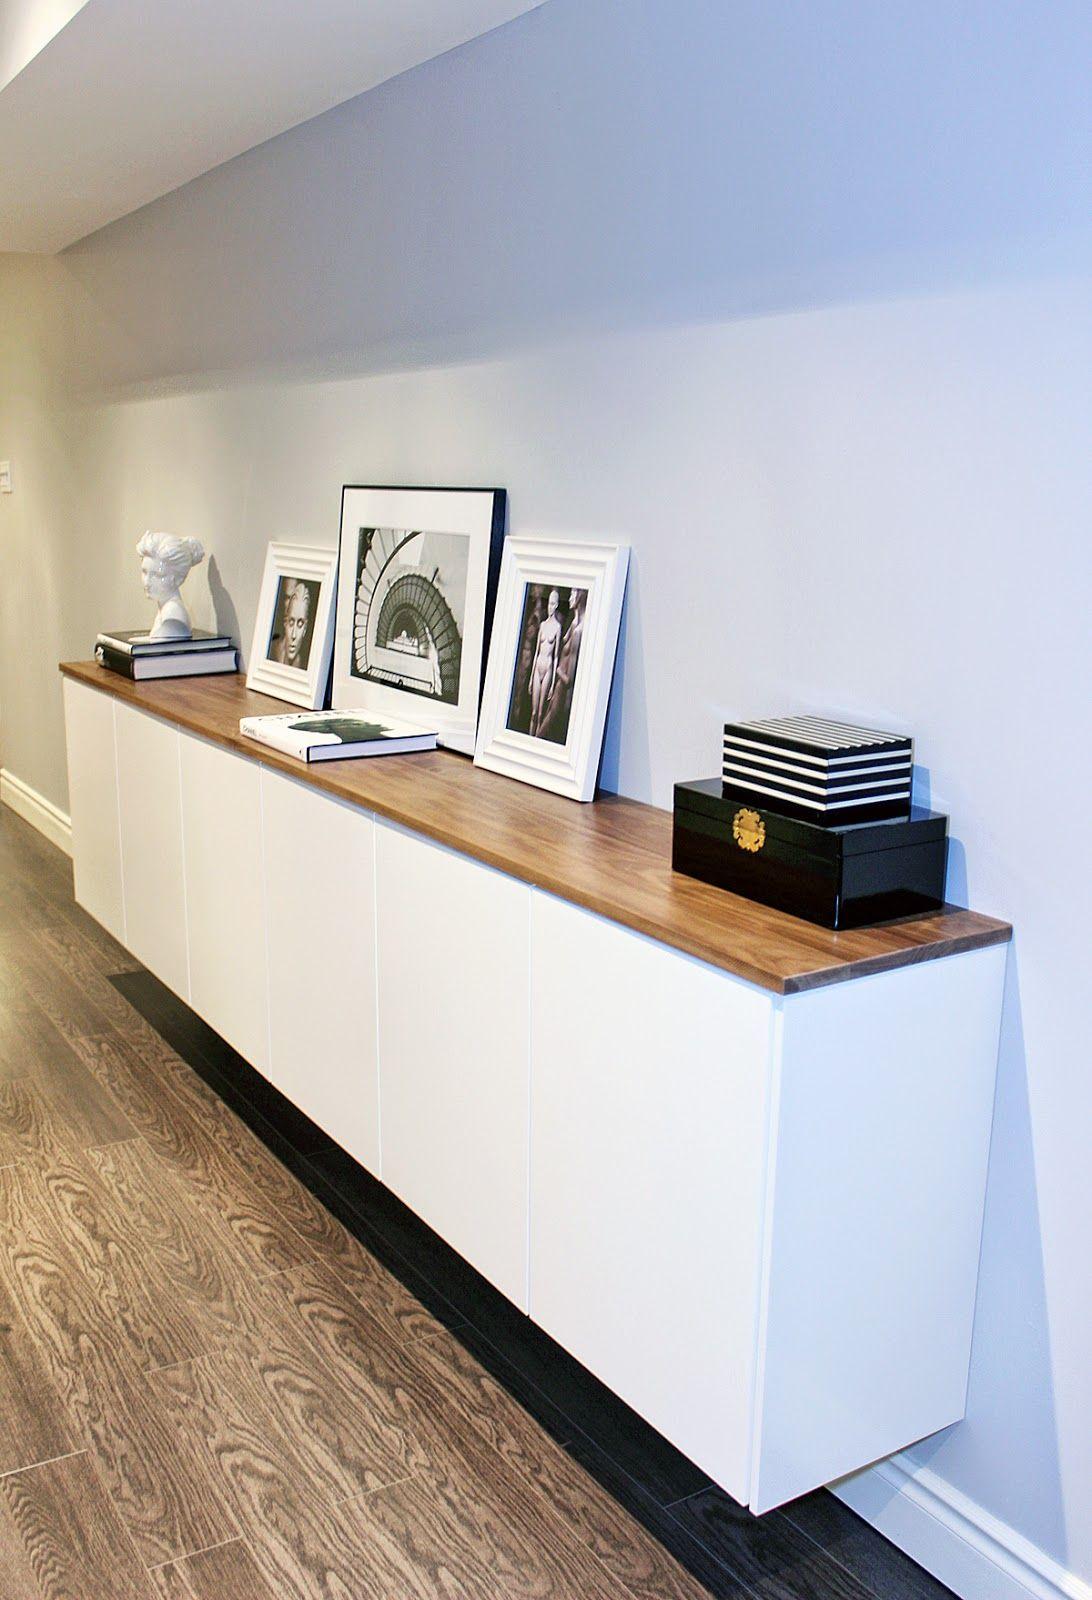 Exceptional Fauxdenza, Basement Hallway Storage, Floating Credenza, Two Tone Credenza,  Mid Century Modern Style, Hallway Credenza